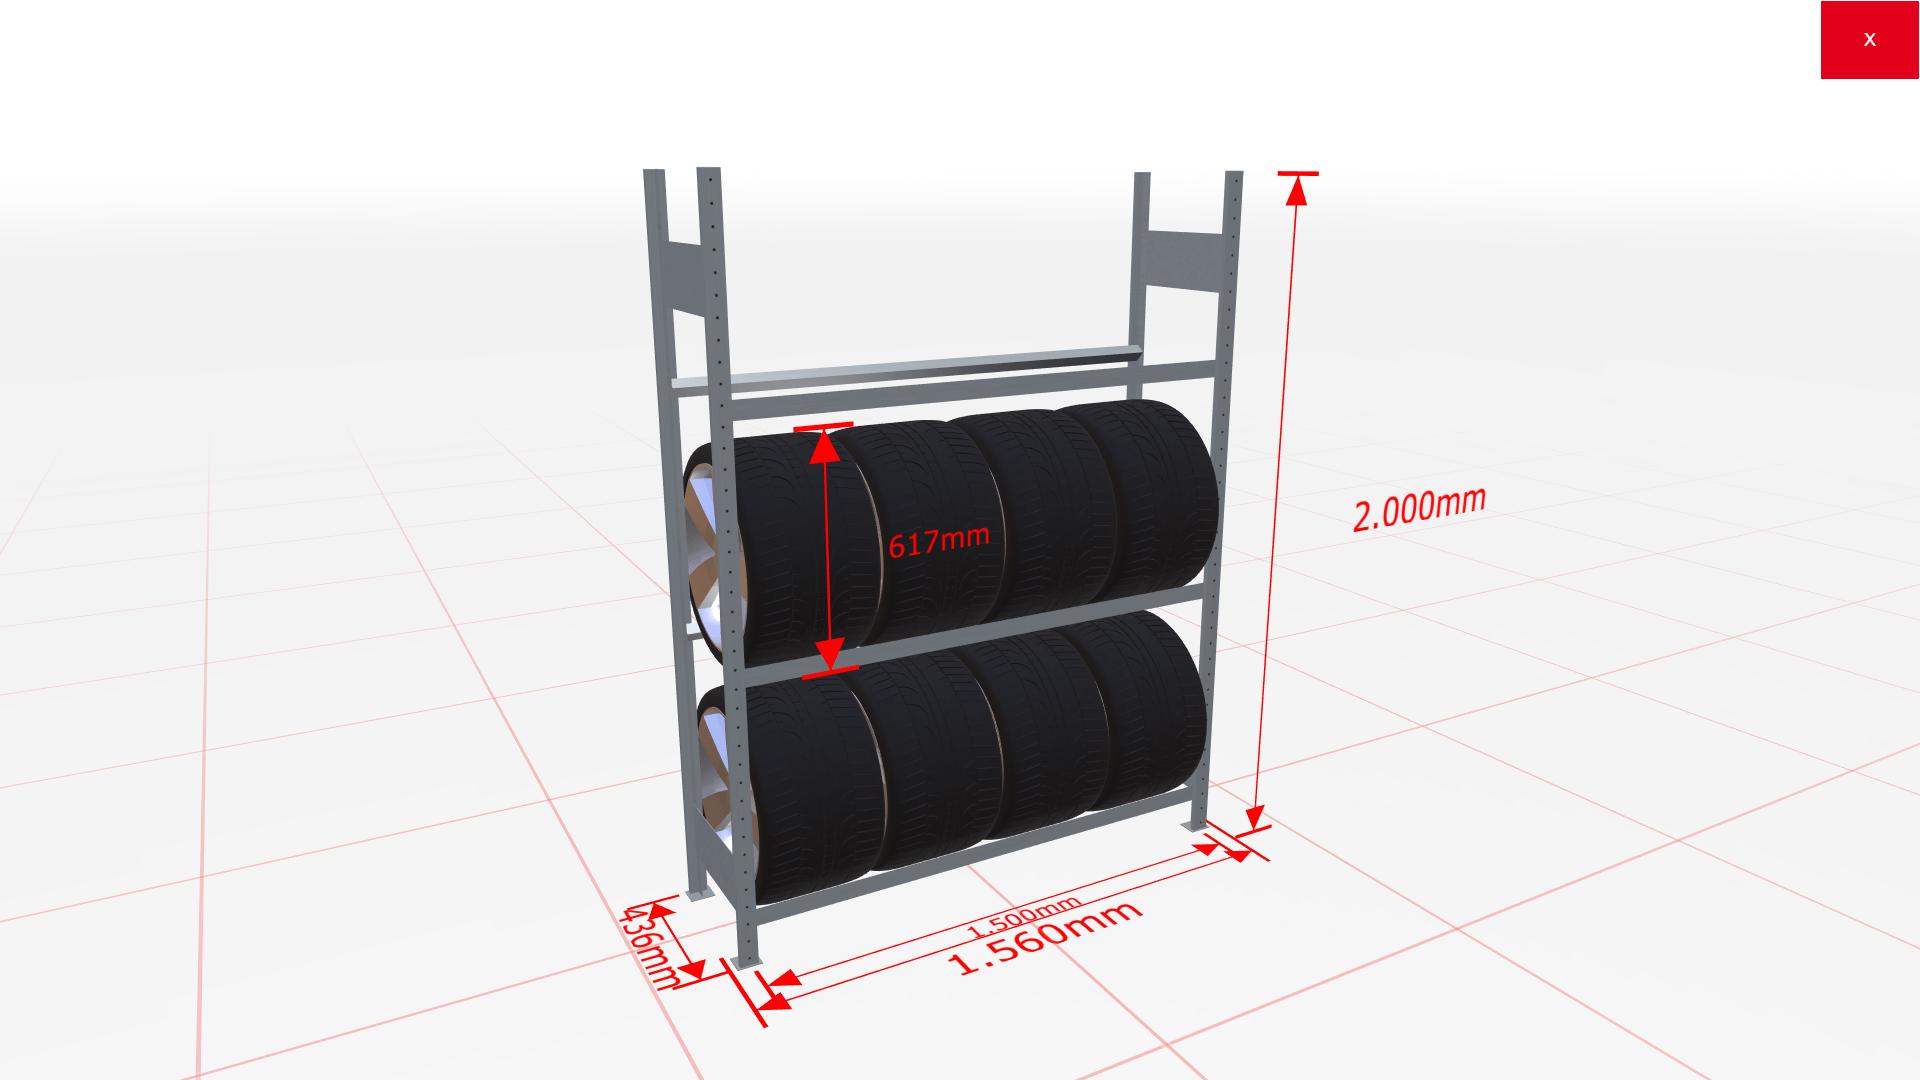 Räderregal Grundregal SCHULTE Lagertechnik 2000x1500x400 mm – 3 Ebenen á 1500 mm, verzinkt